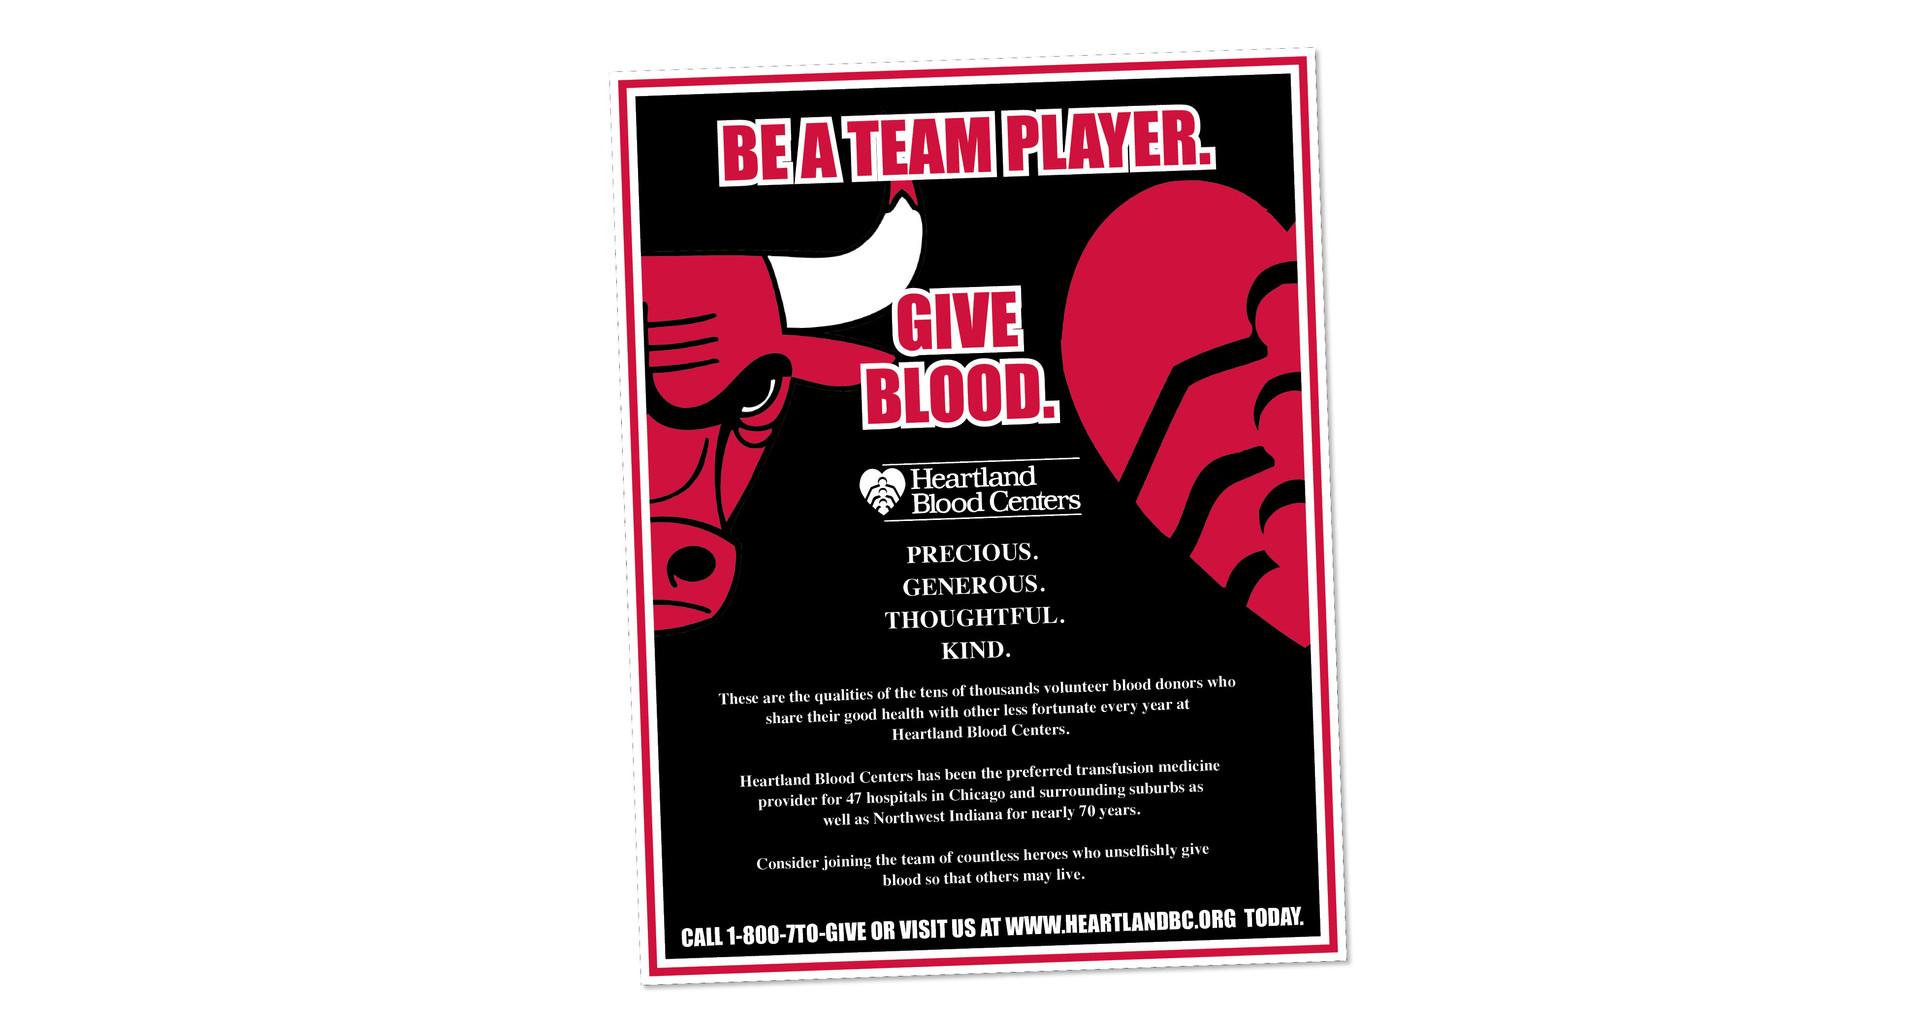 Heartland Blood Centers